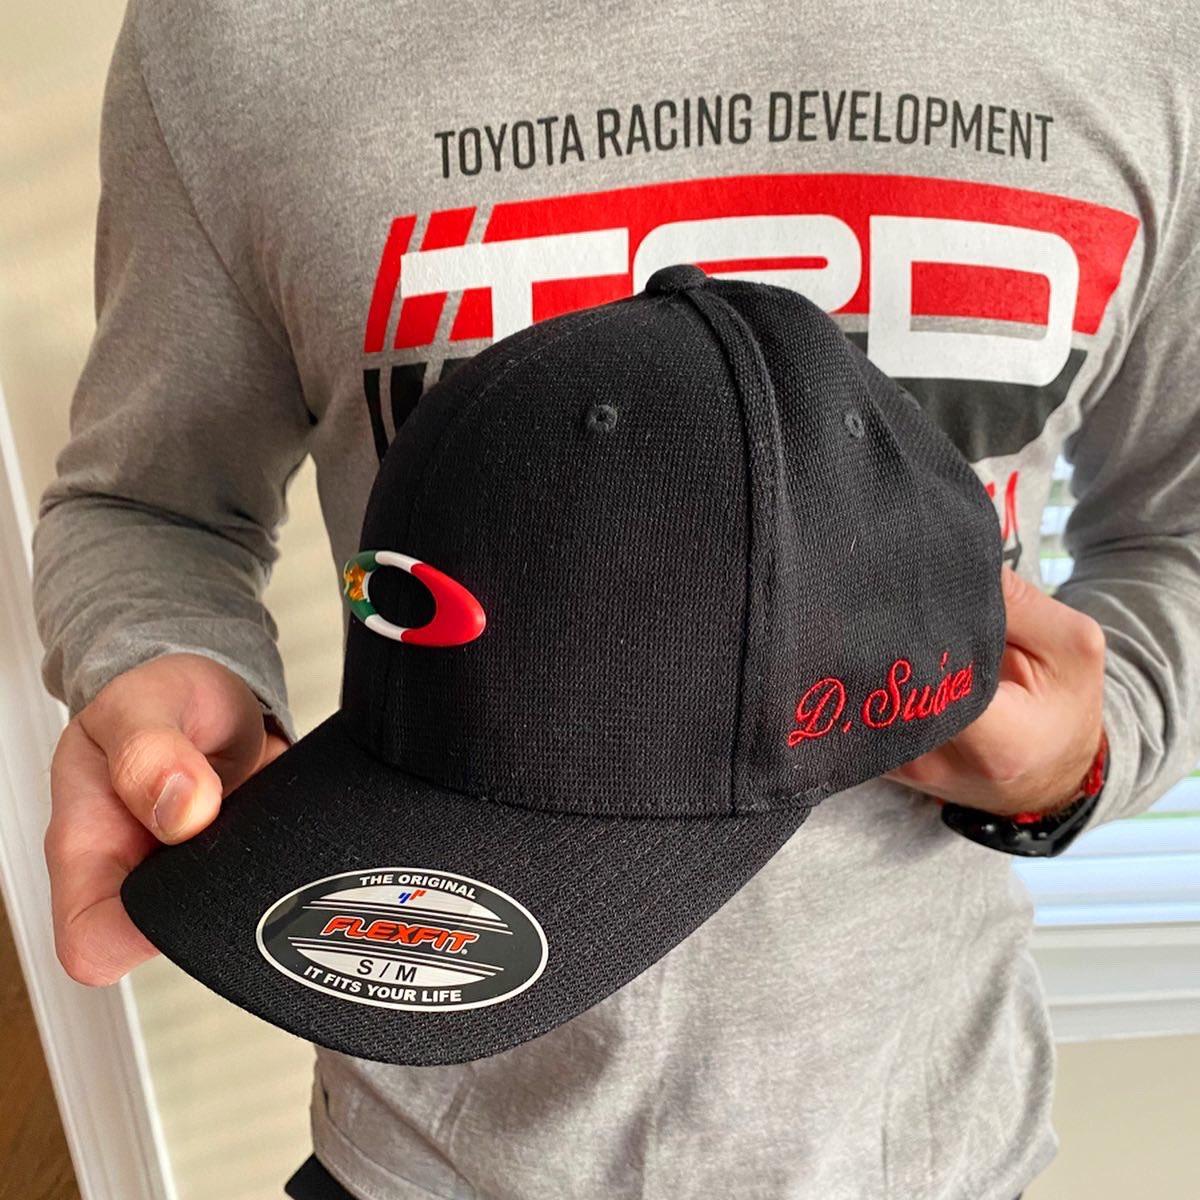 Coolest hat! 🧢🇲🇽 Big thank you to @club_ac3z for this amazing gift 🤙🏼 • Muchas gracias compa @club_ac3z por mi nueva gorra 😍 A seguirle dando duro 💪🏼🇲🇽  #SuarezNation #DanielsAmigos #TeamToyota